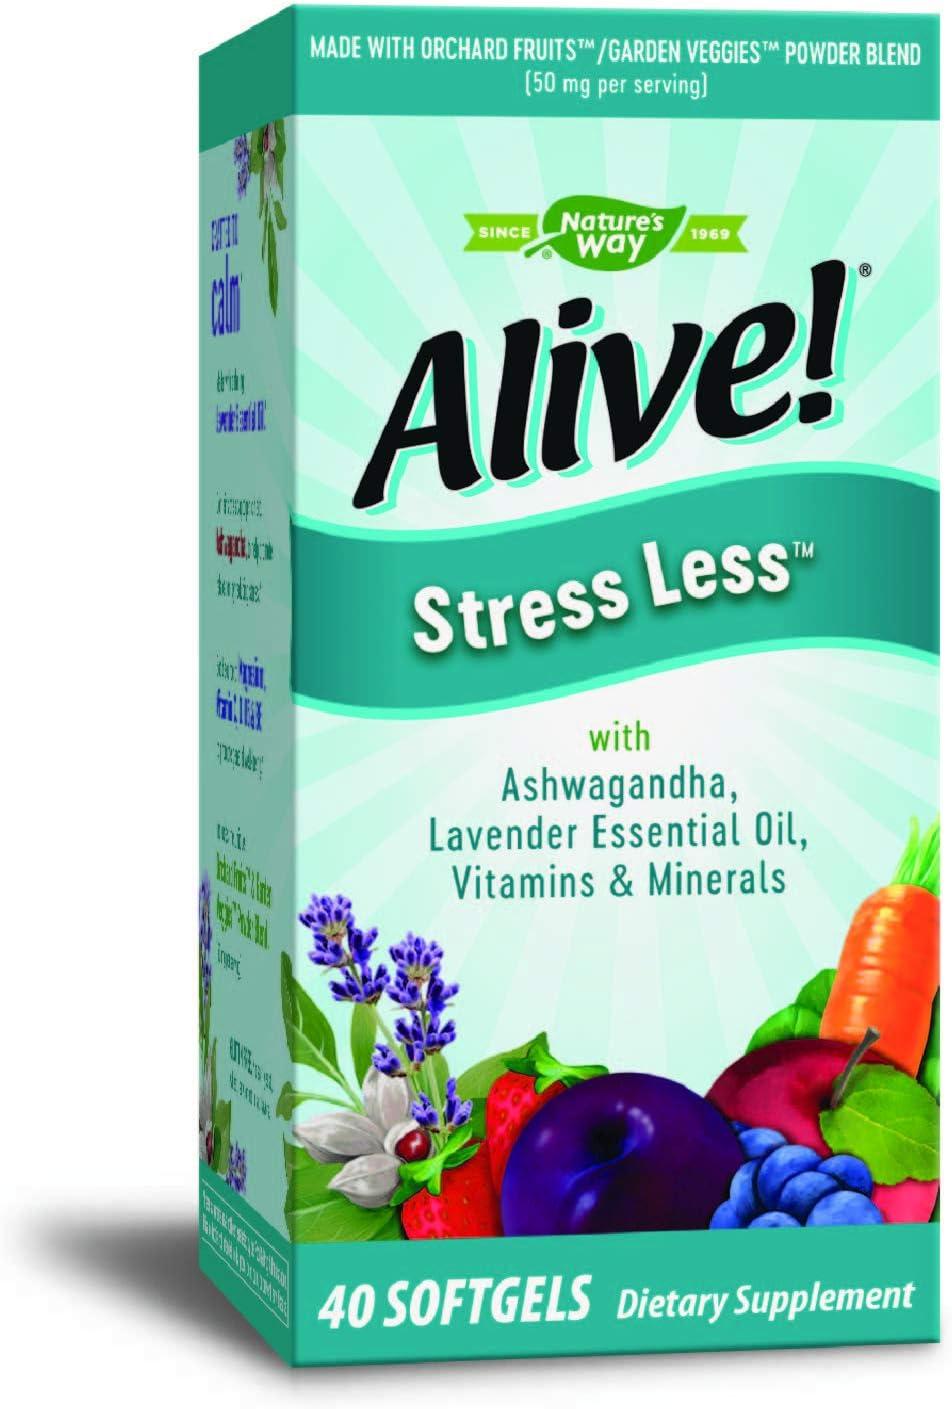 Nature's Way Alive! Stress Less Vitamin Supplement, Ashwagandha, Lavender Essential Oil, Vitamins C, D, B5, B6, 40 Count